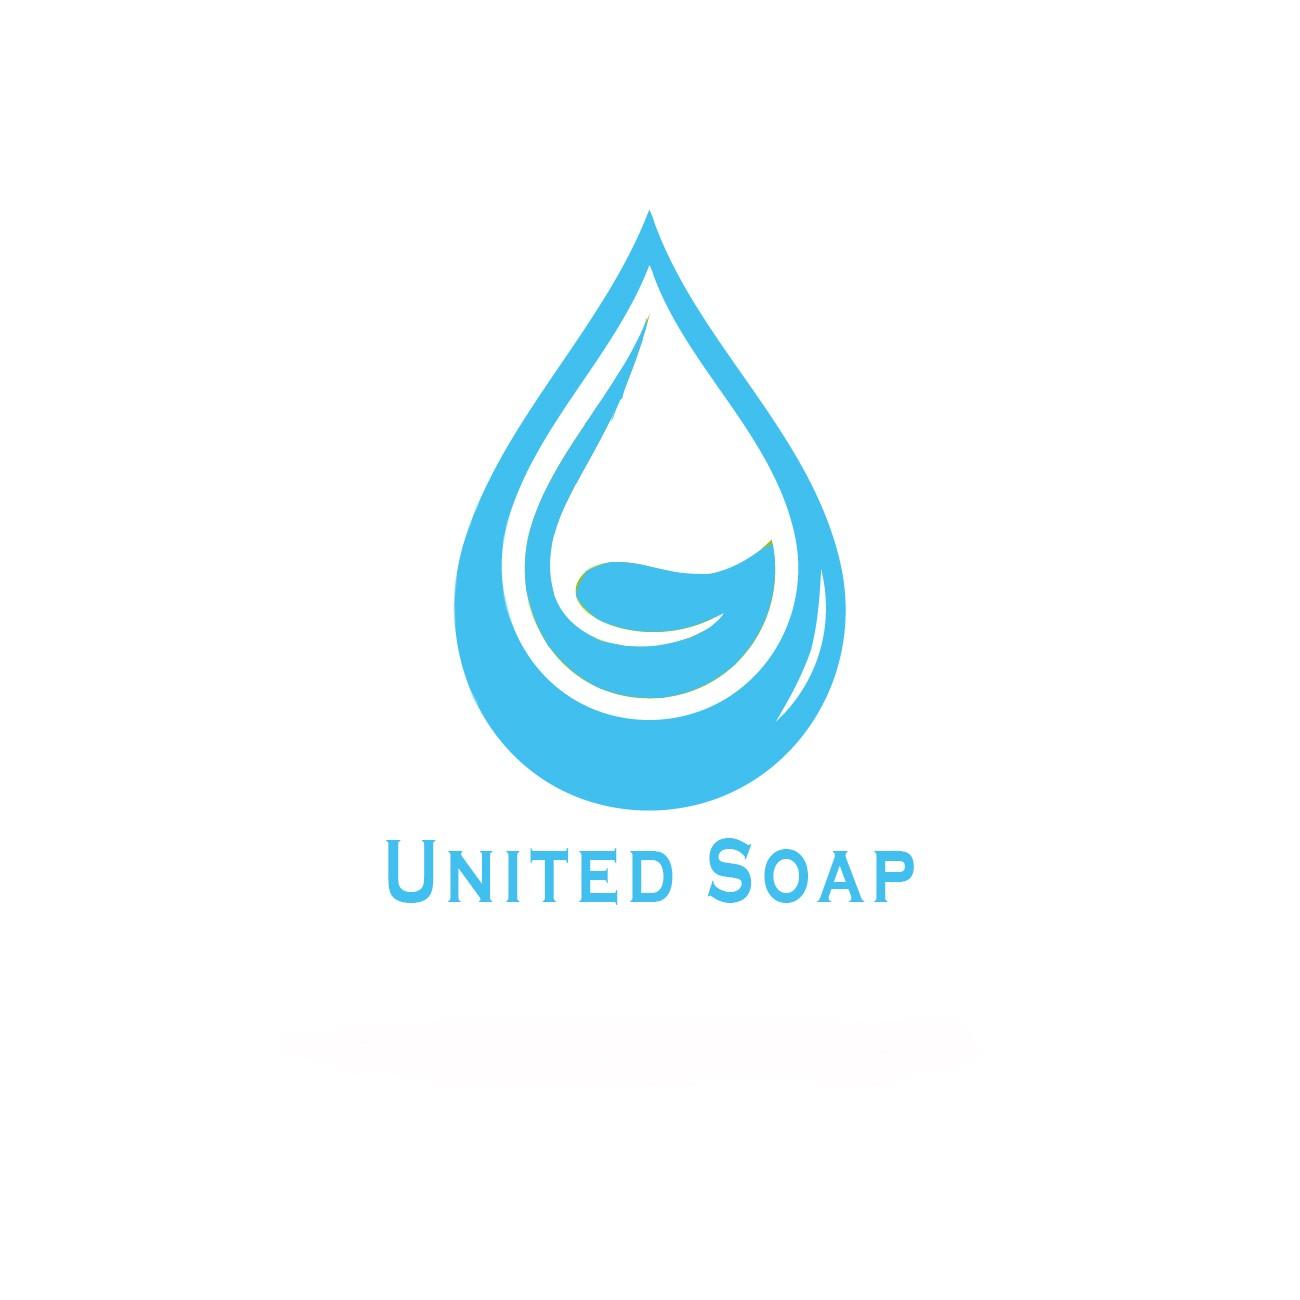 United Soap